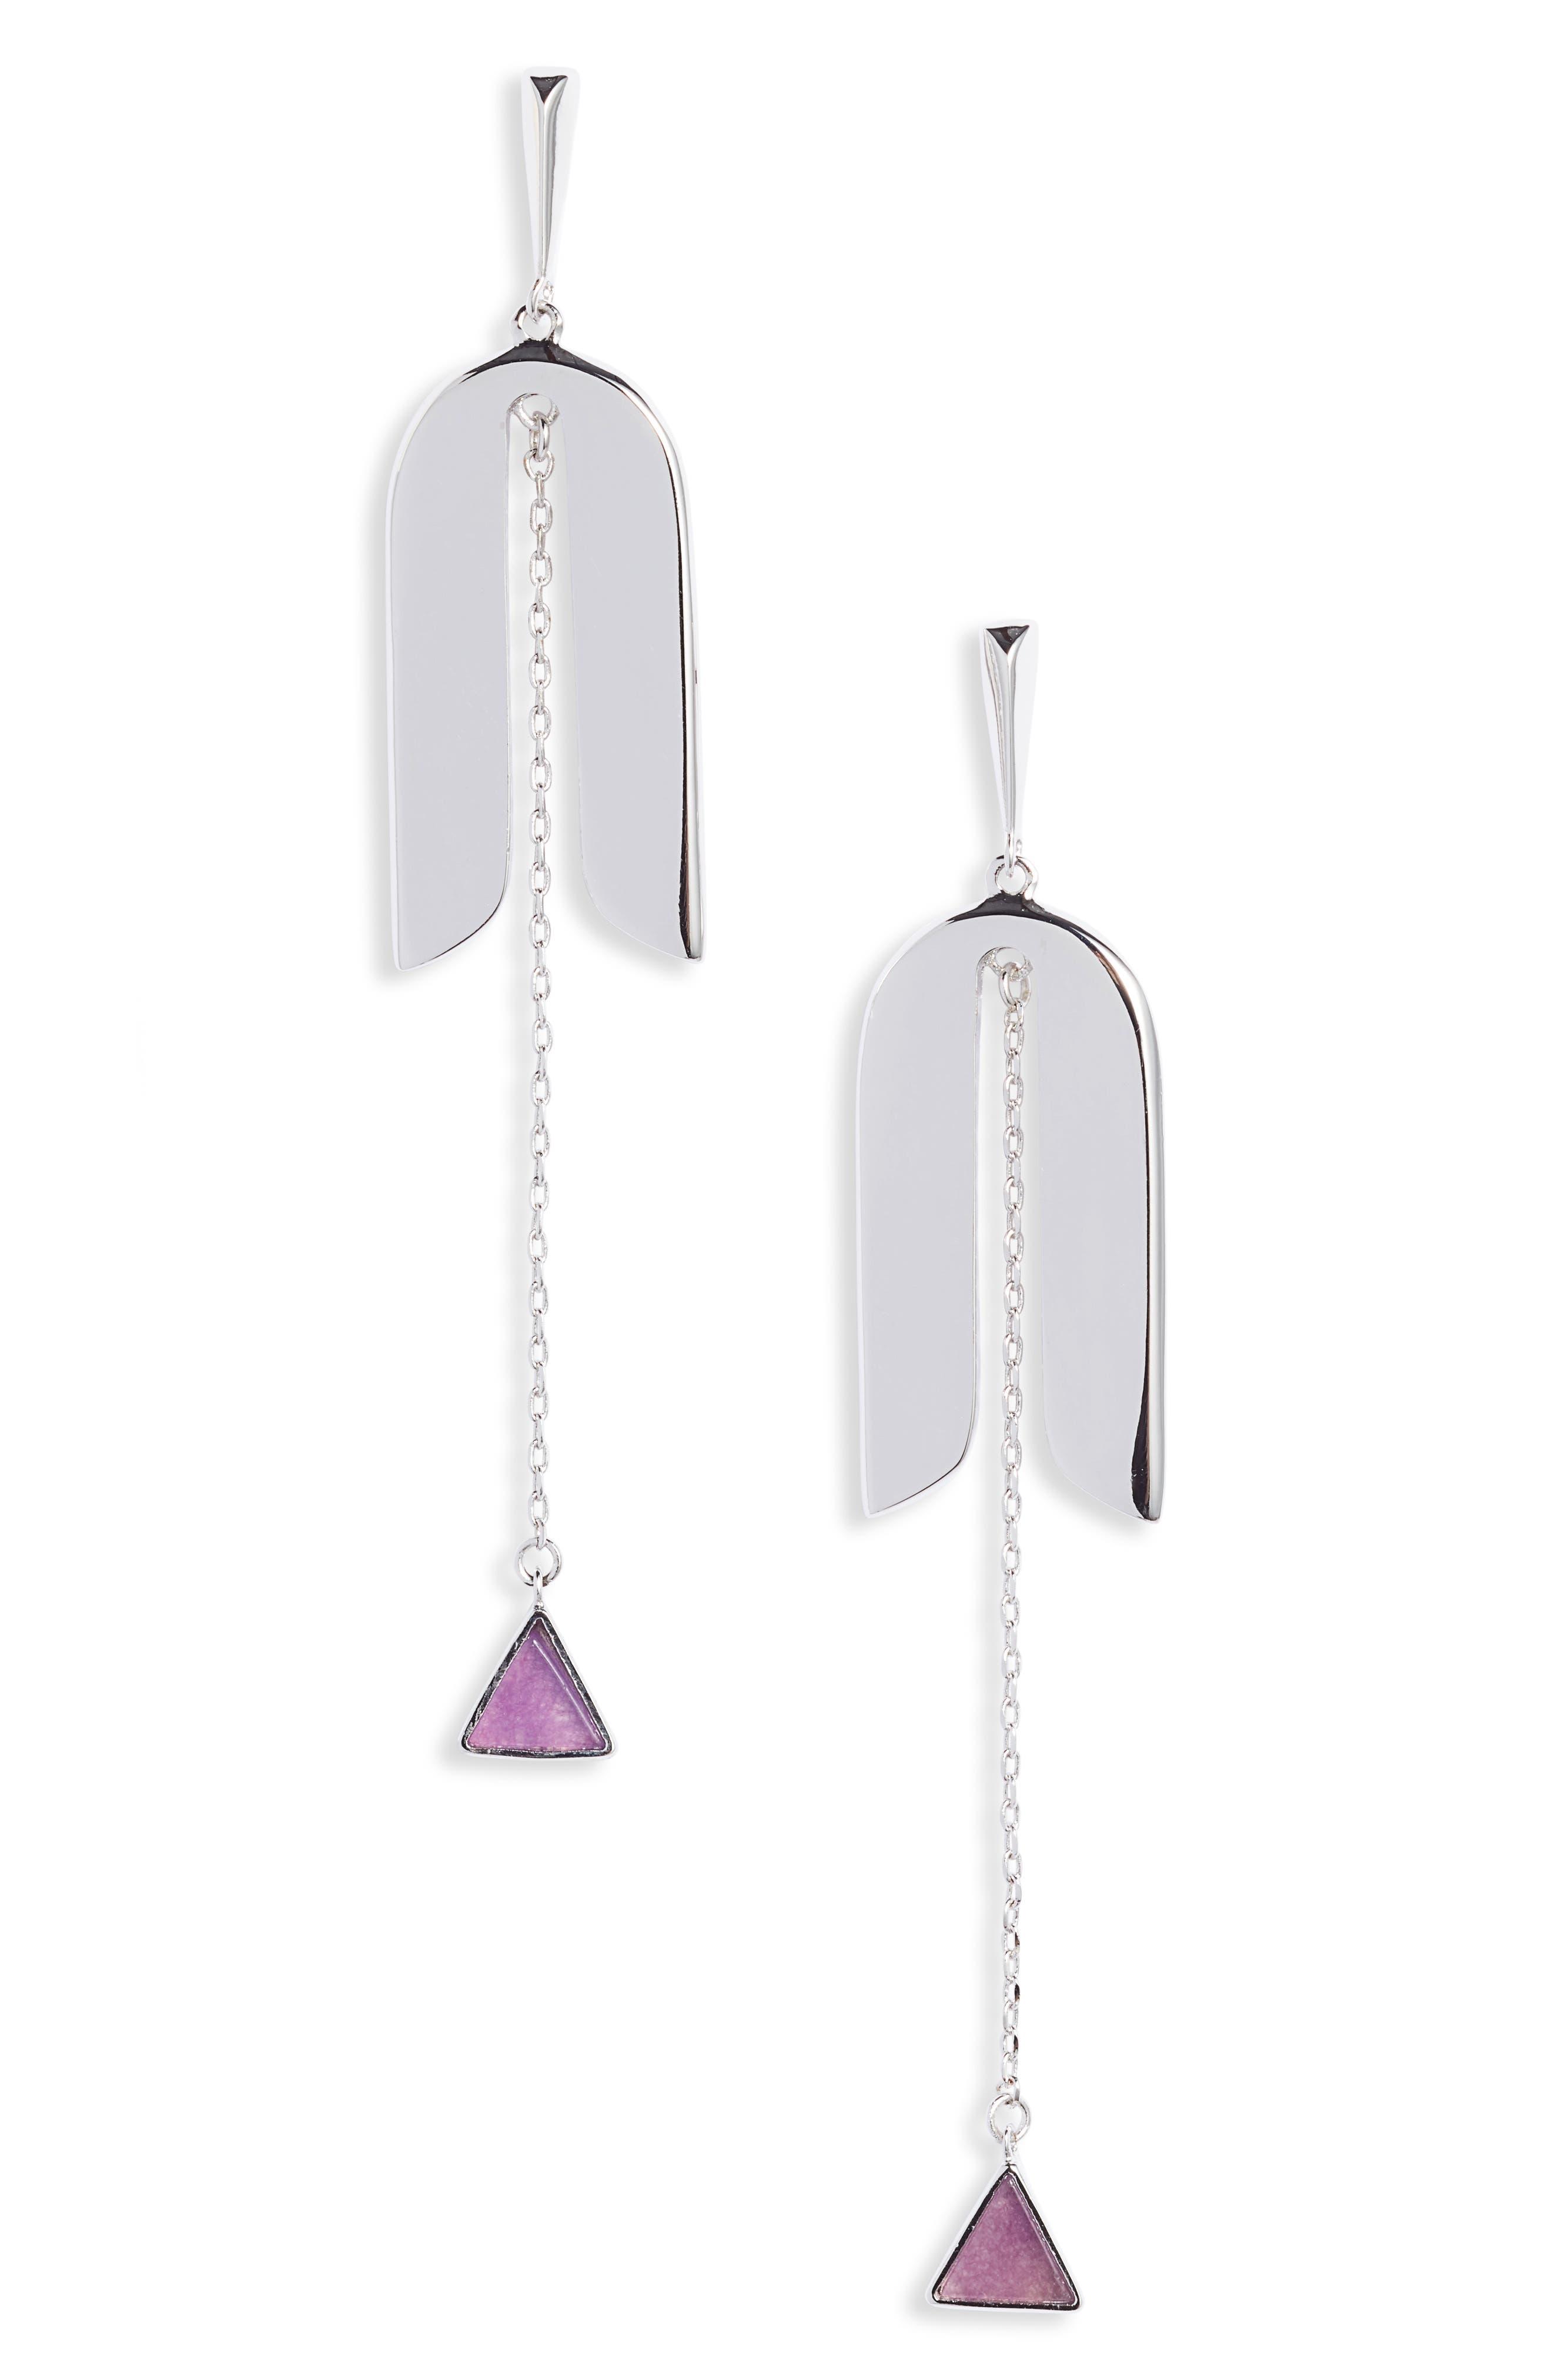 Image of kate spade new york modern icon linear earrings